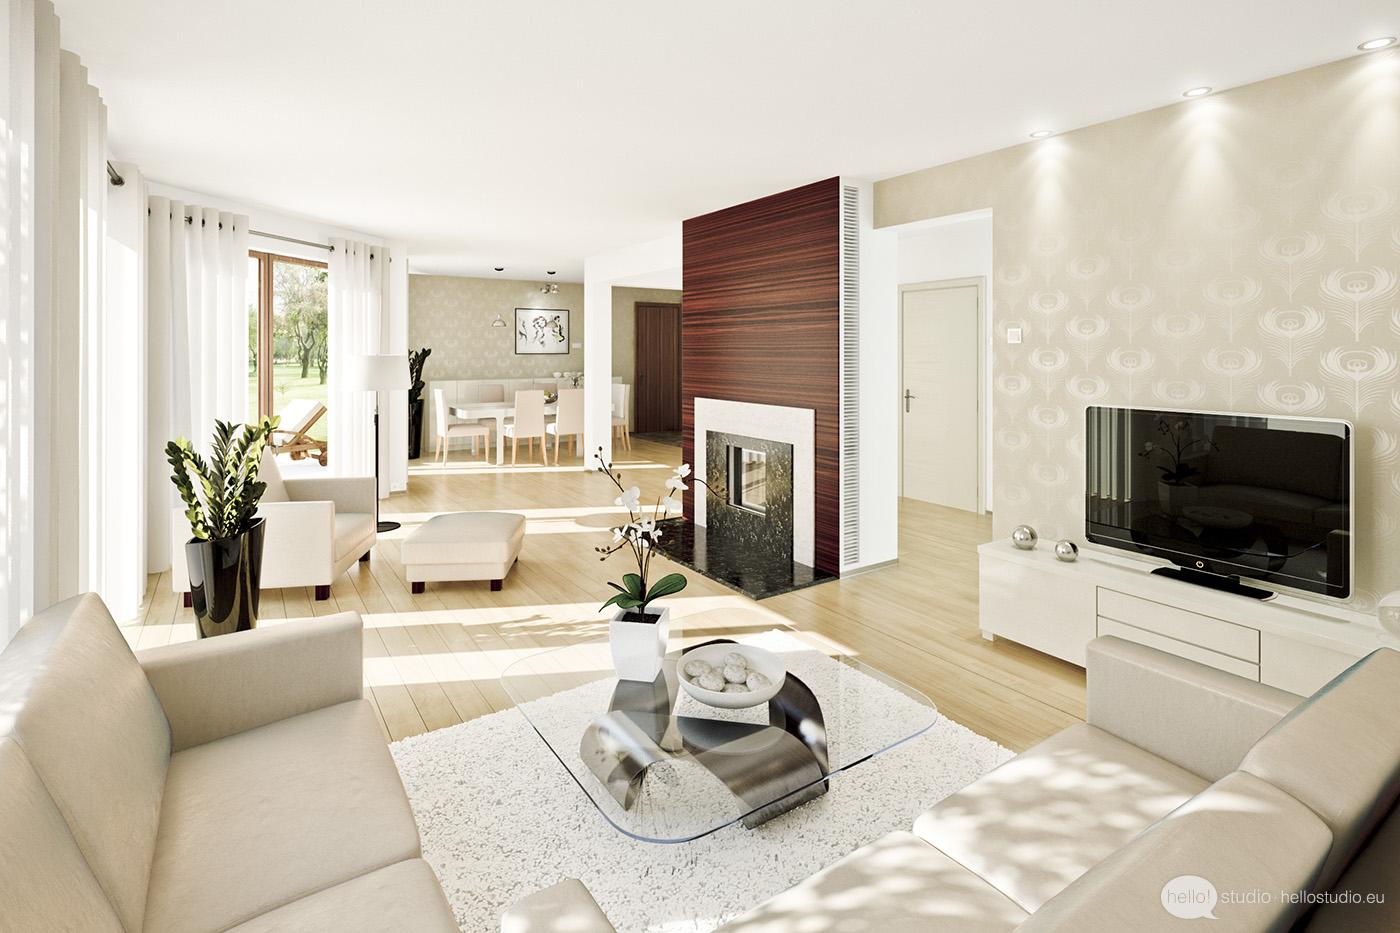 Living room pictures on vaporbullfl com